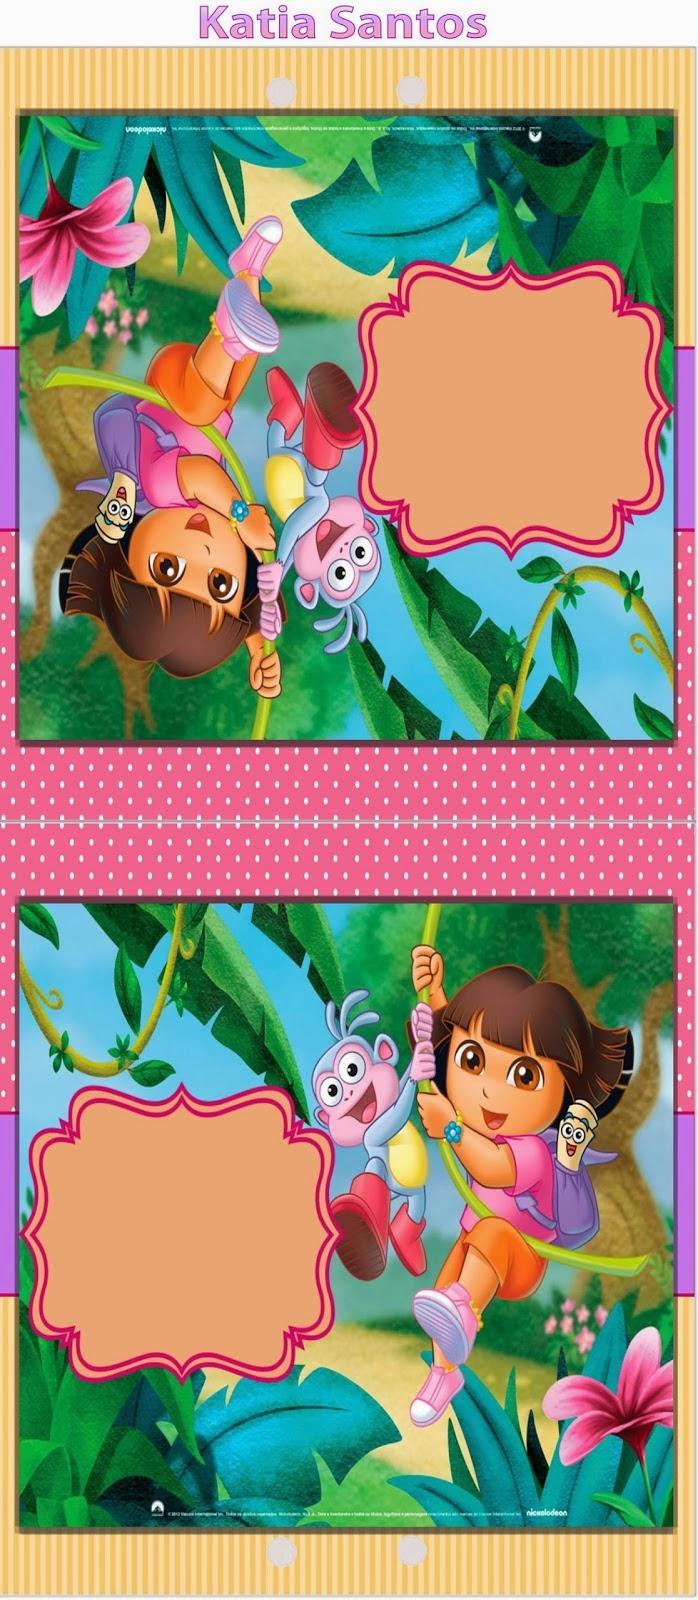 Dora The Explorer: Free Printable Invitations, Boxes And Party - Dora The Explorer Free Printable Invitations